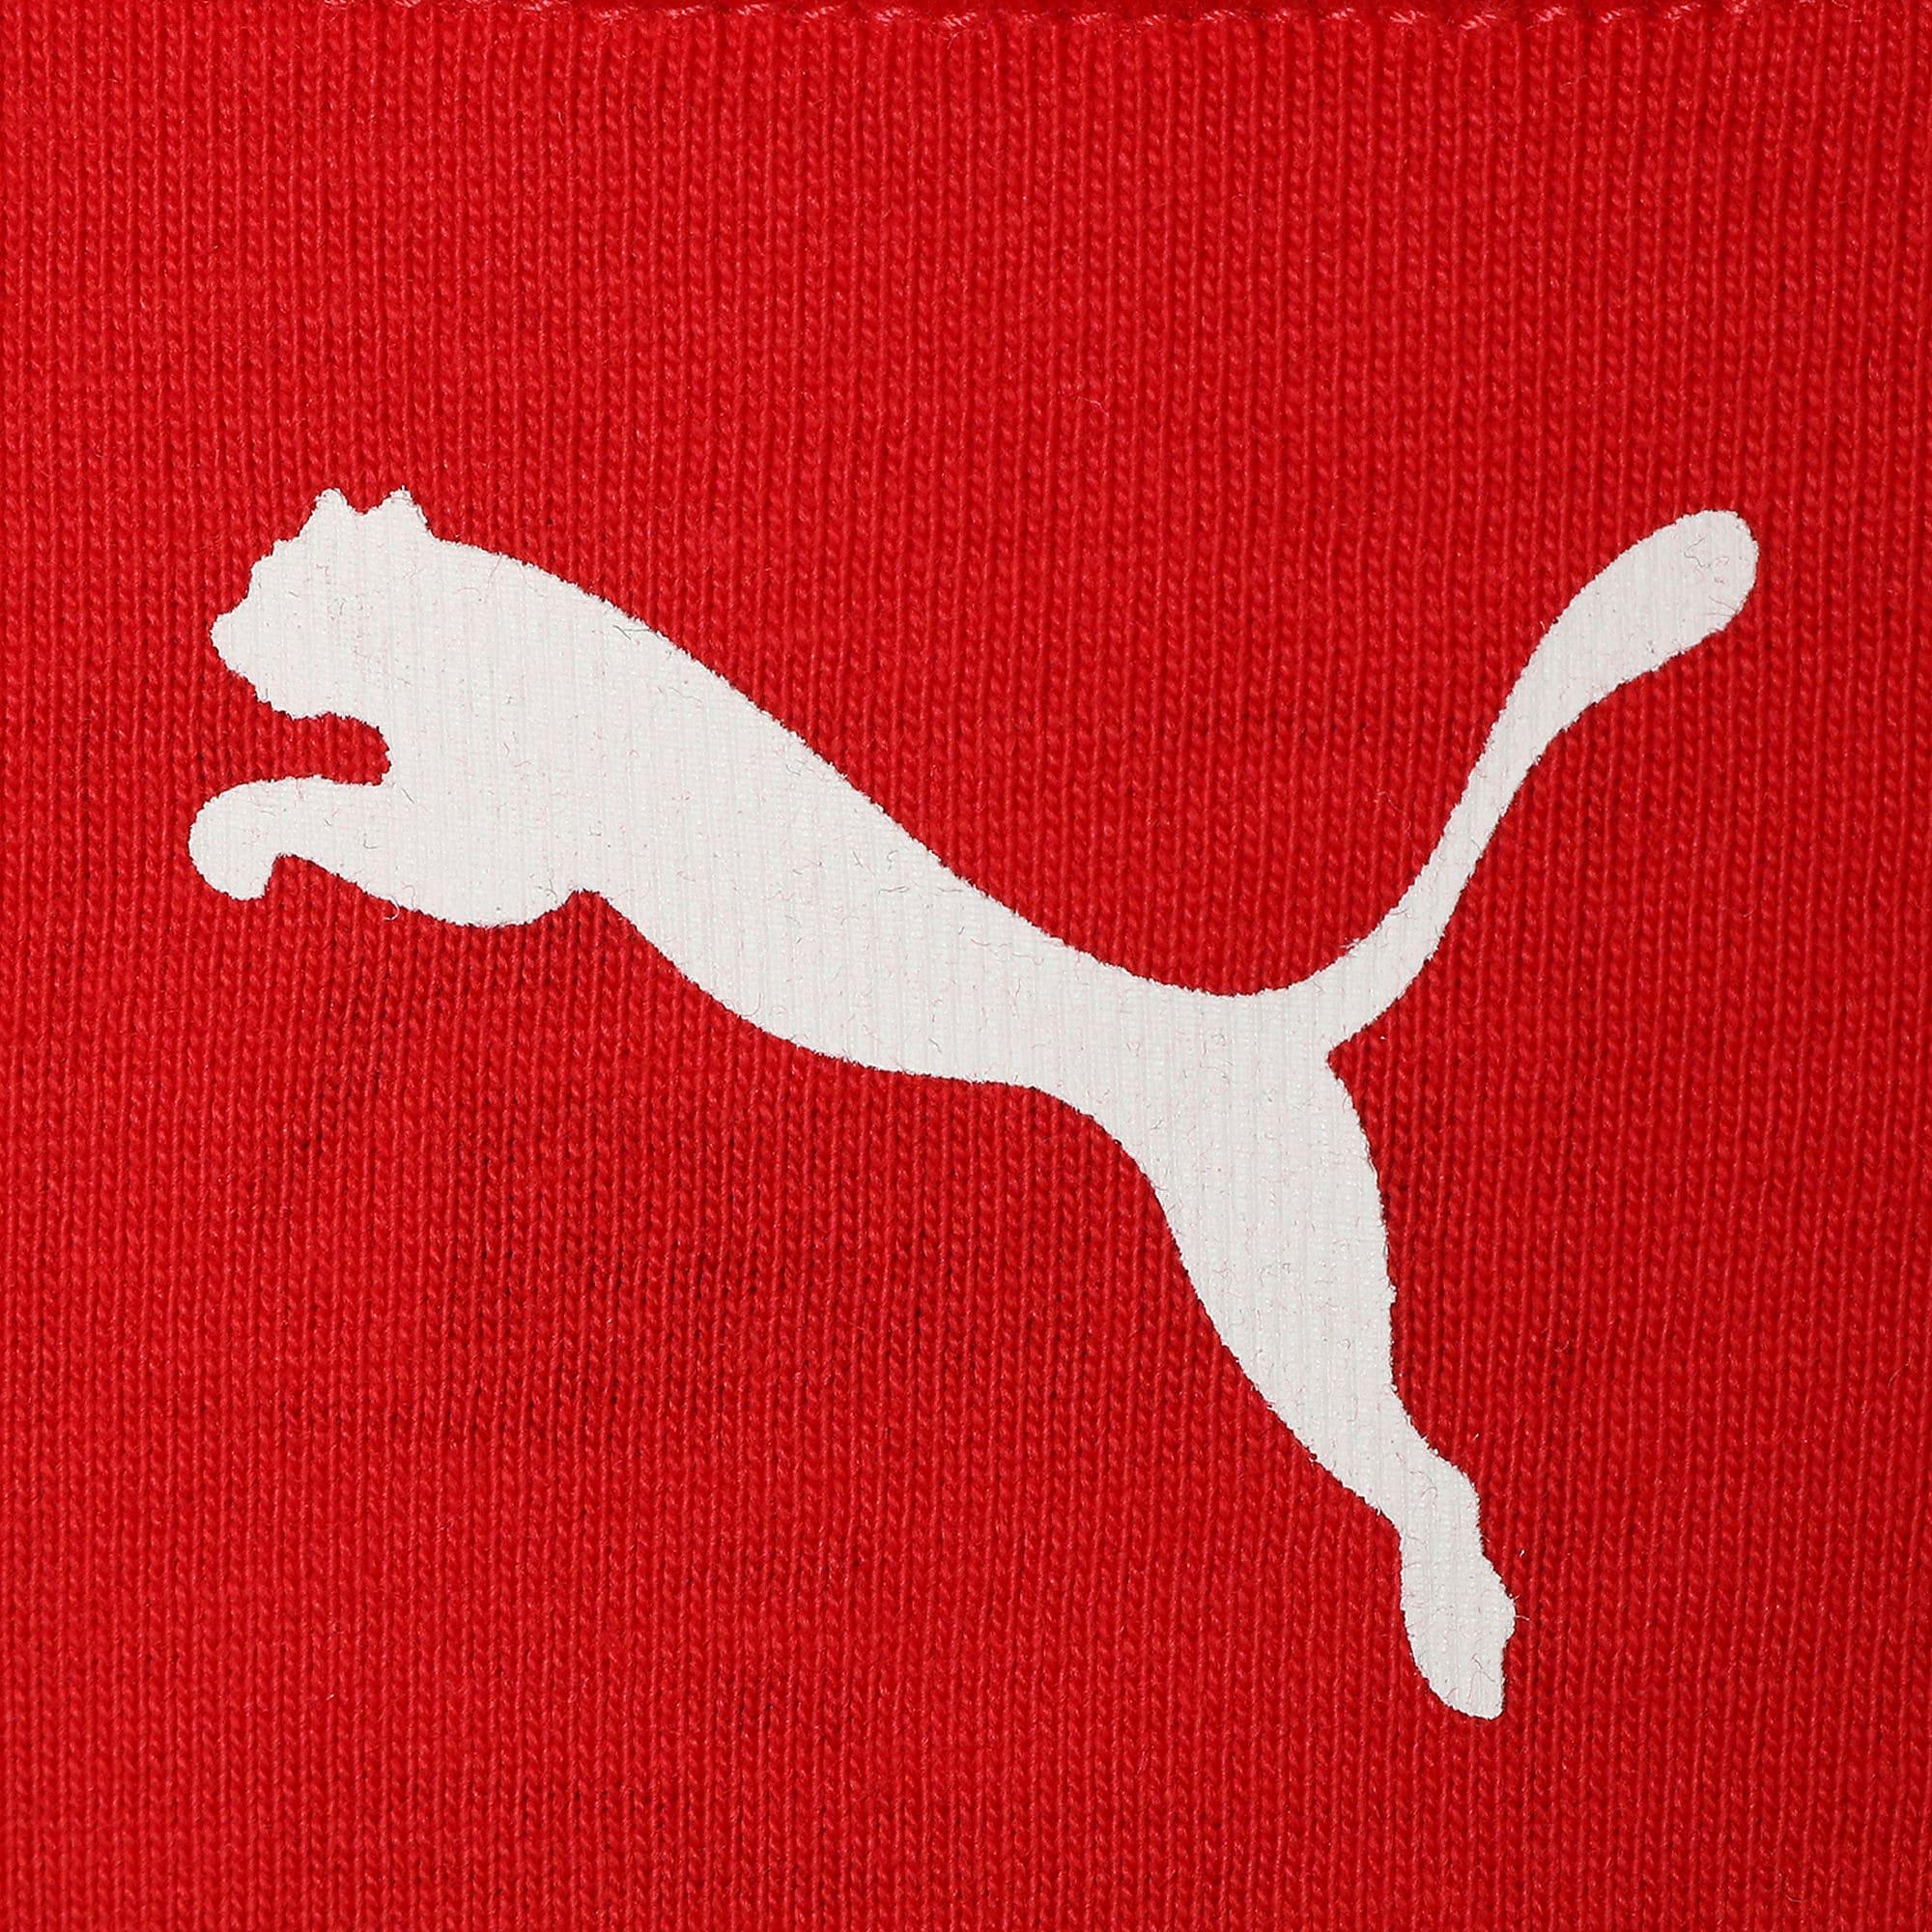 Thumbnail 4 of キッズ ALPHA SS グラフィック Tシャツ 半袖, High Risk Red, medium-JPN